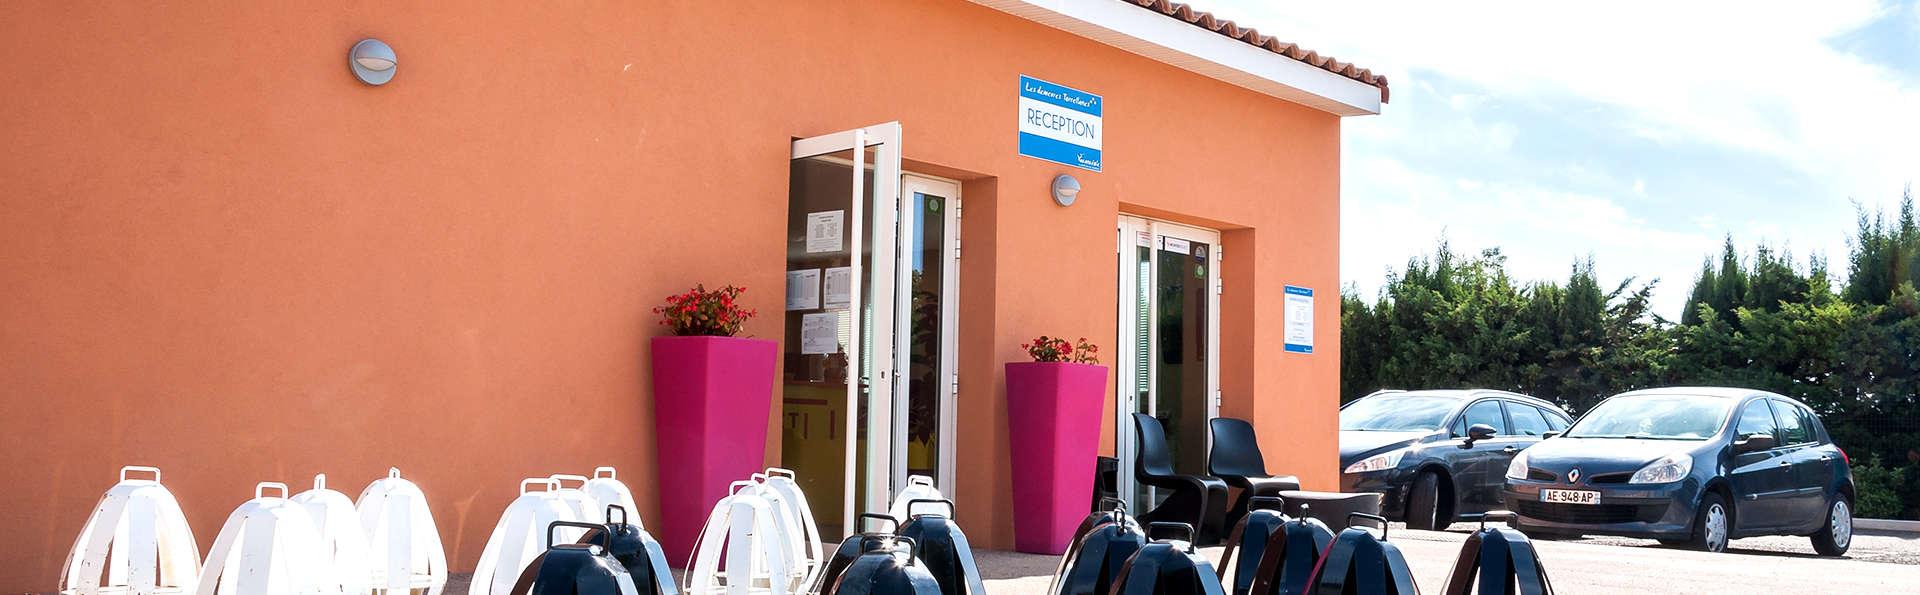 Vacanceole Demeures Torellanes St Cyprien - Edit_Front5.jpg